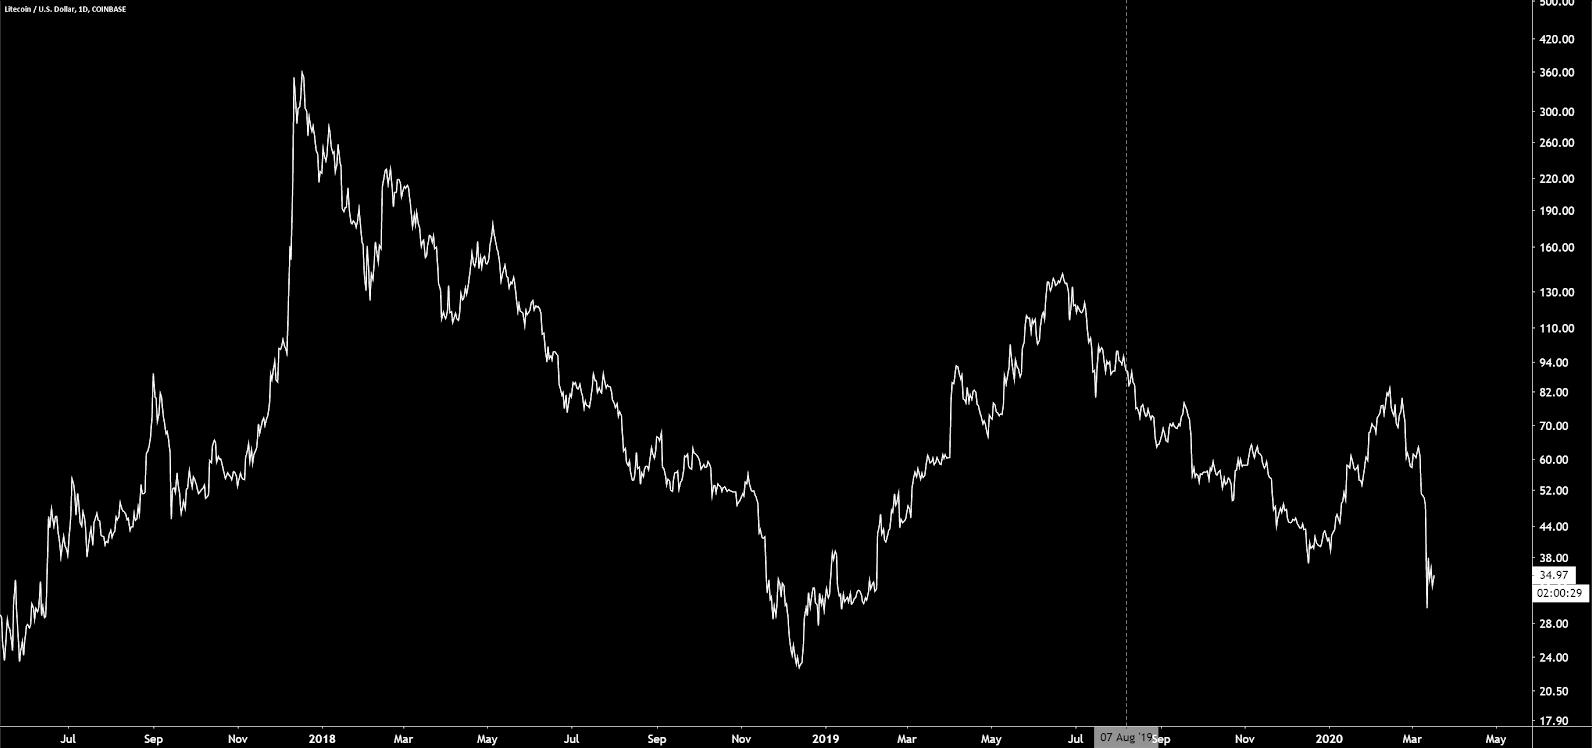 Litecoin Price Analysis 18 Mar 2020 (1)